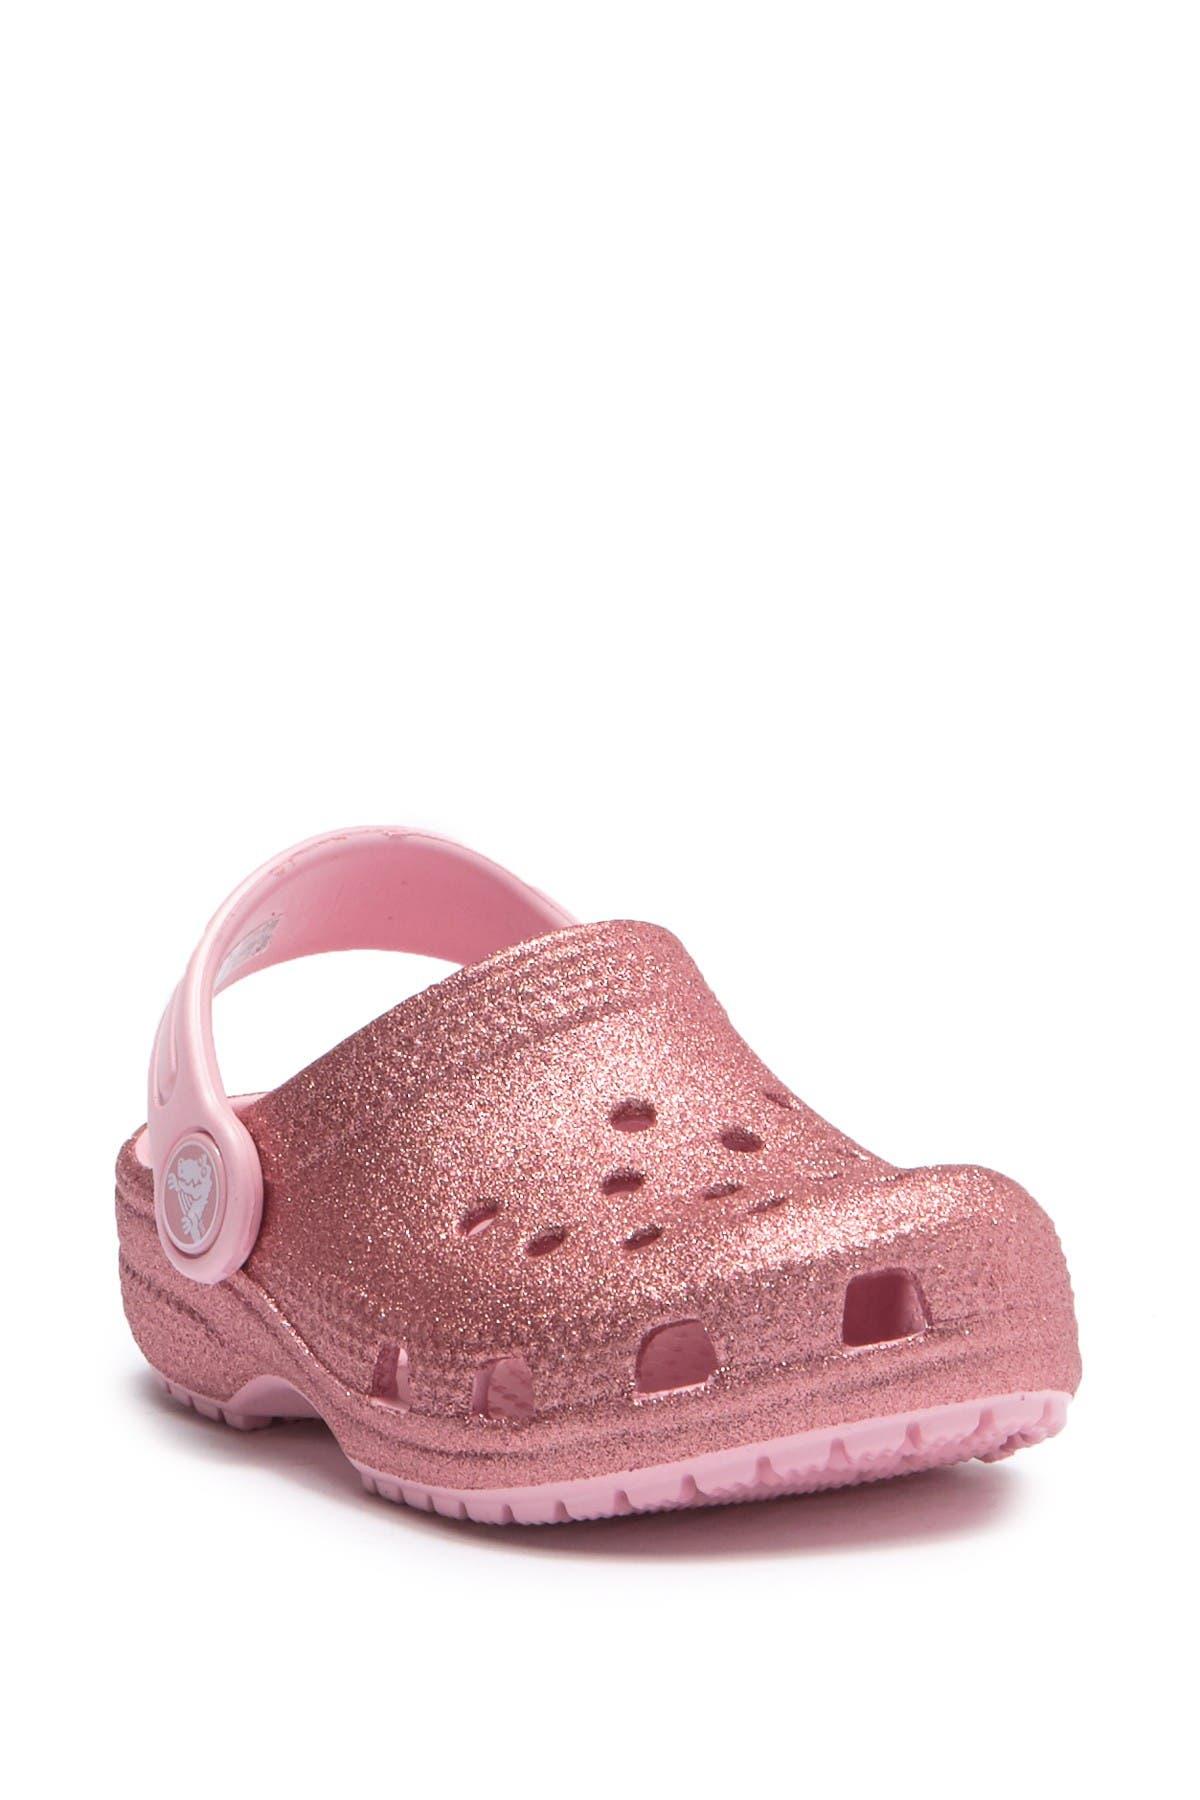 Crocs | Classic Glitter Clog